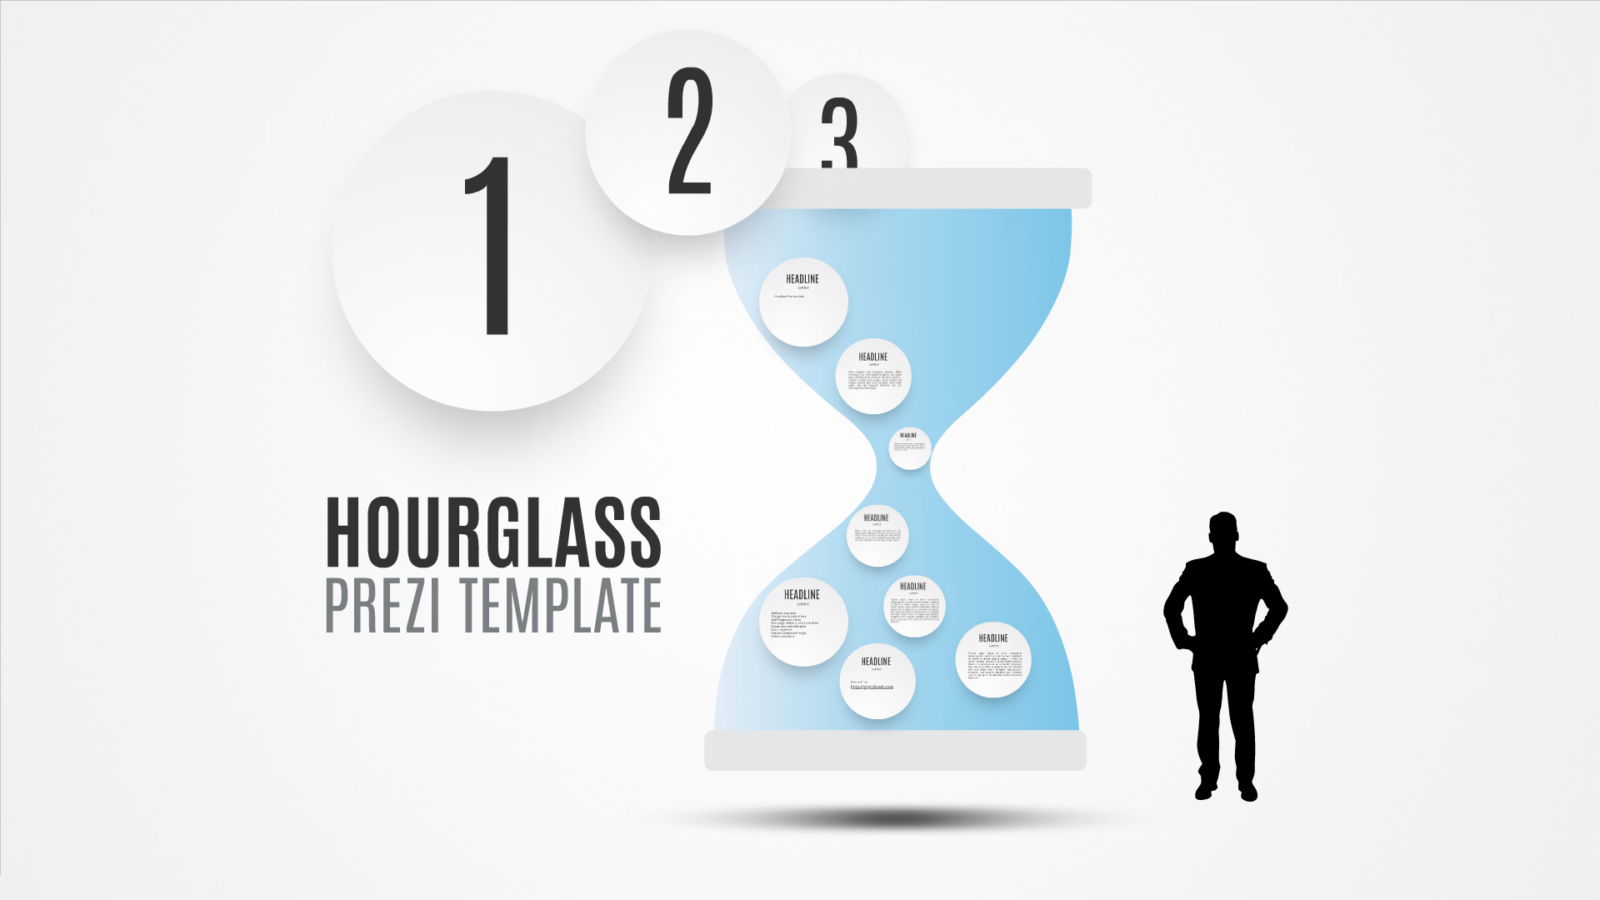 Hourglass Prezi template